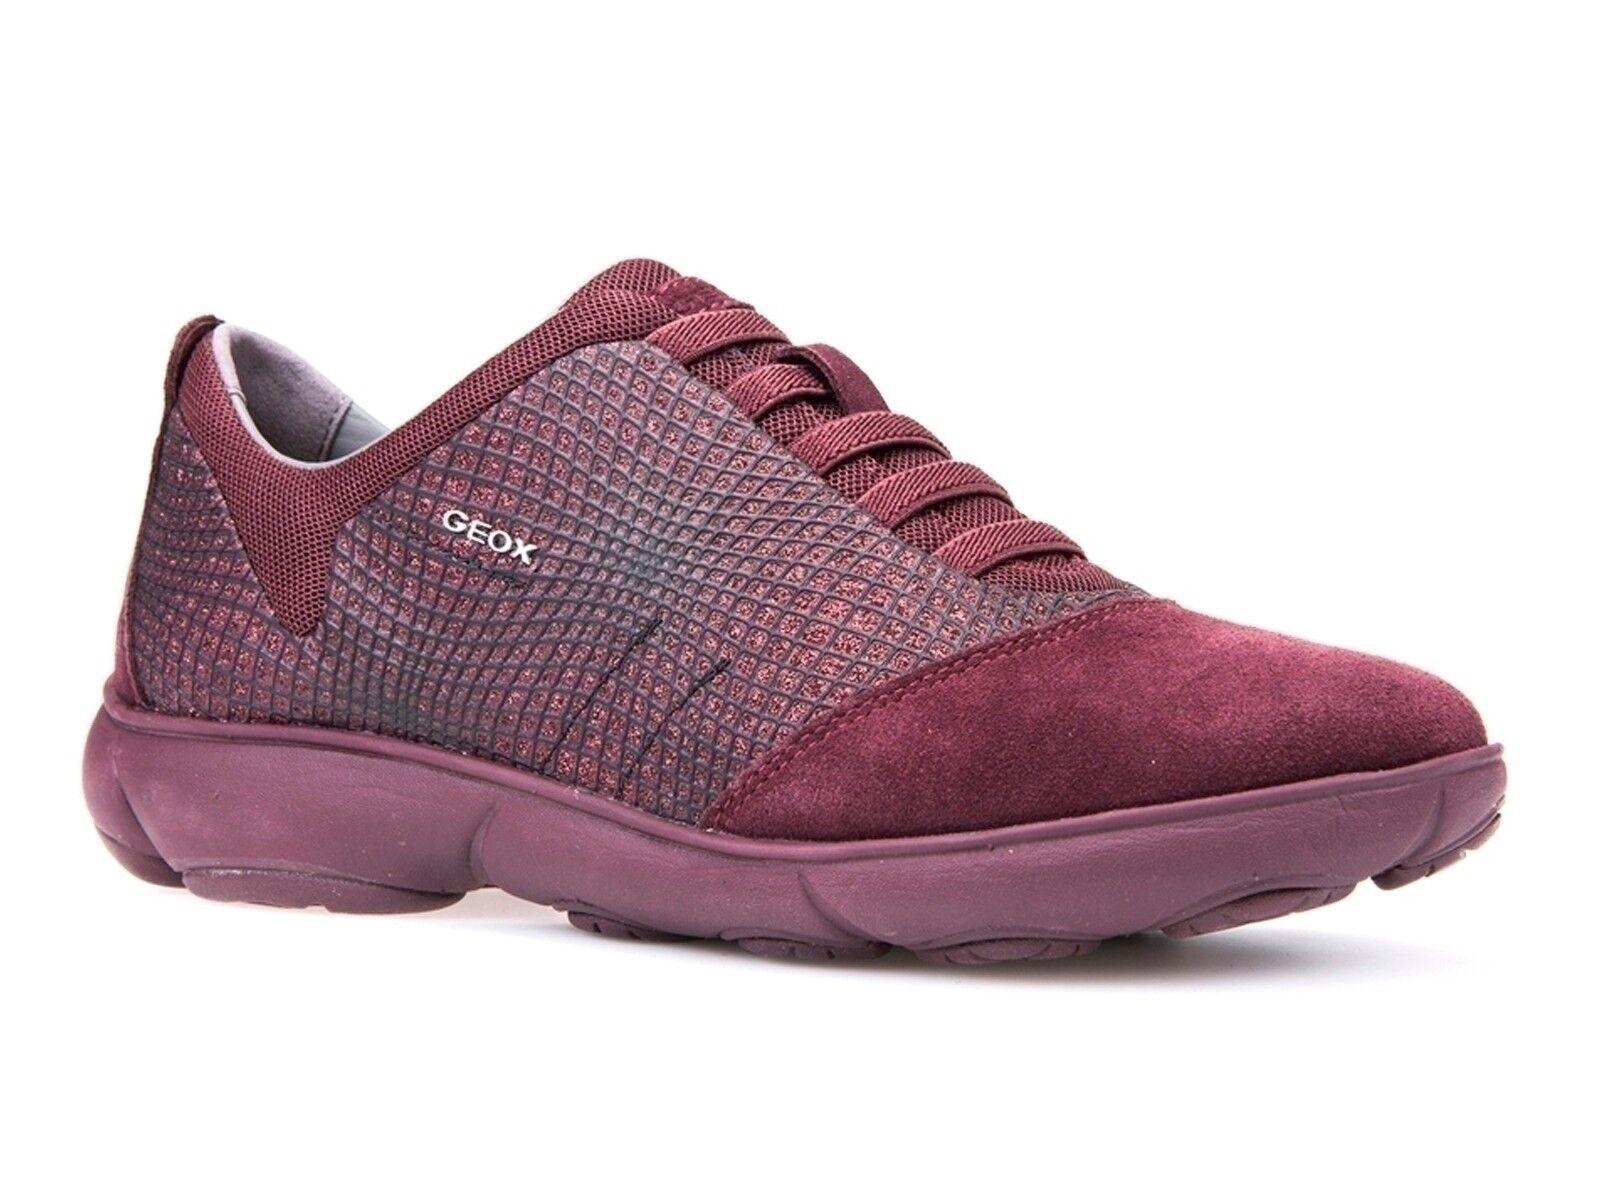 chaussures femmes GEOX INVERNO D741EA 09L22 C7357  NEBULA DK BURGUNDY